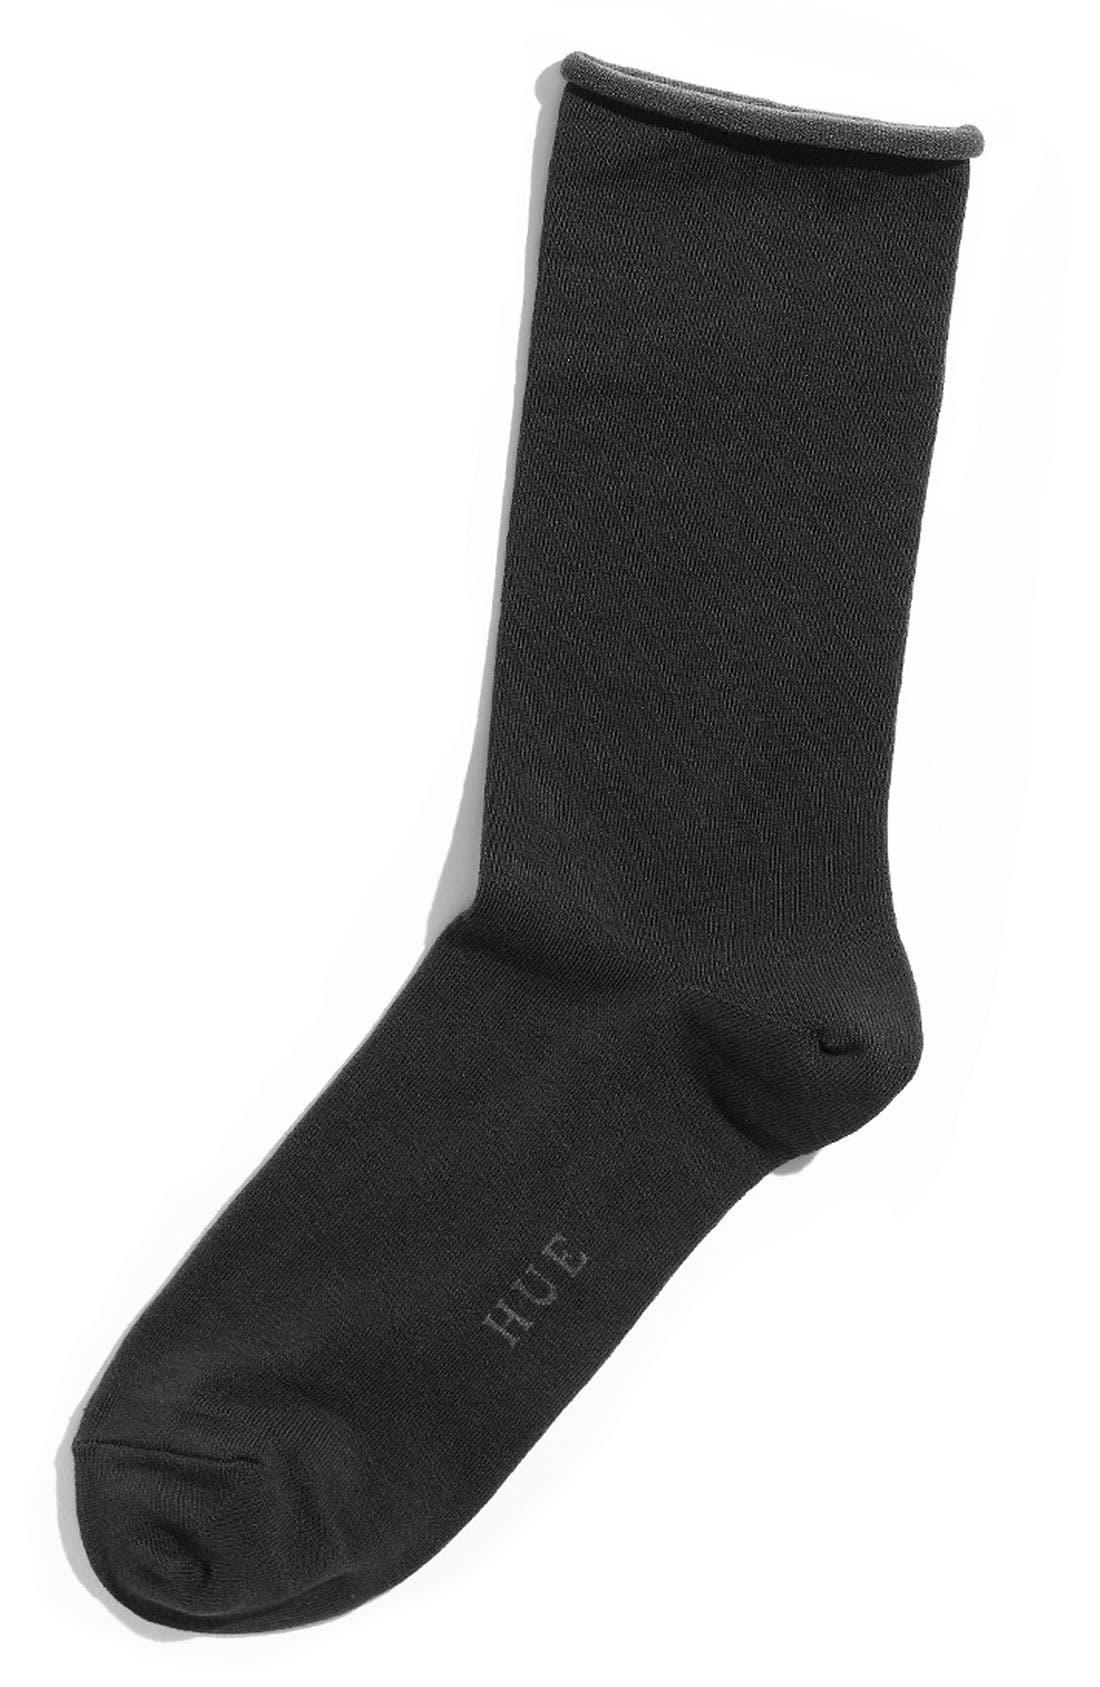 Hue 'Jeans' Socks